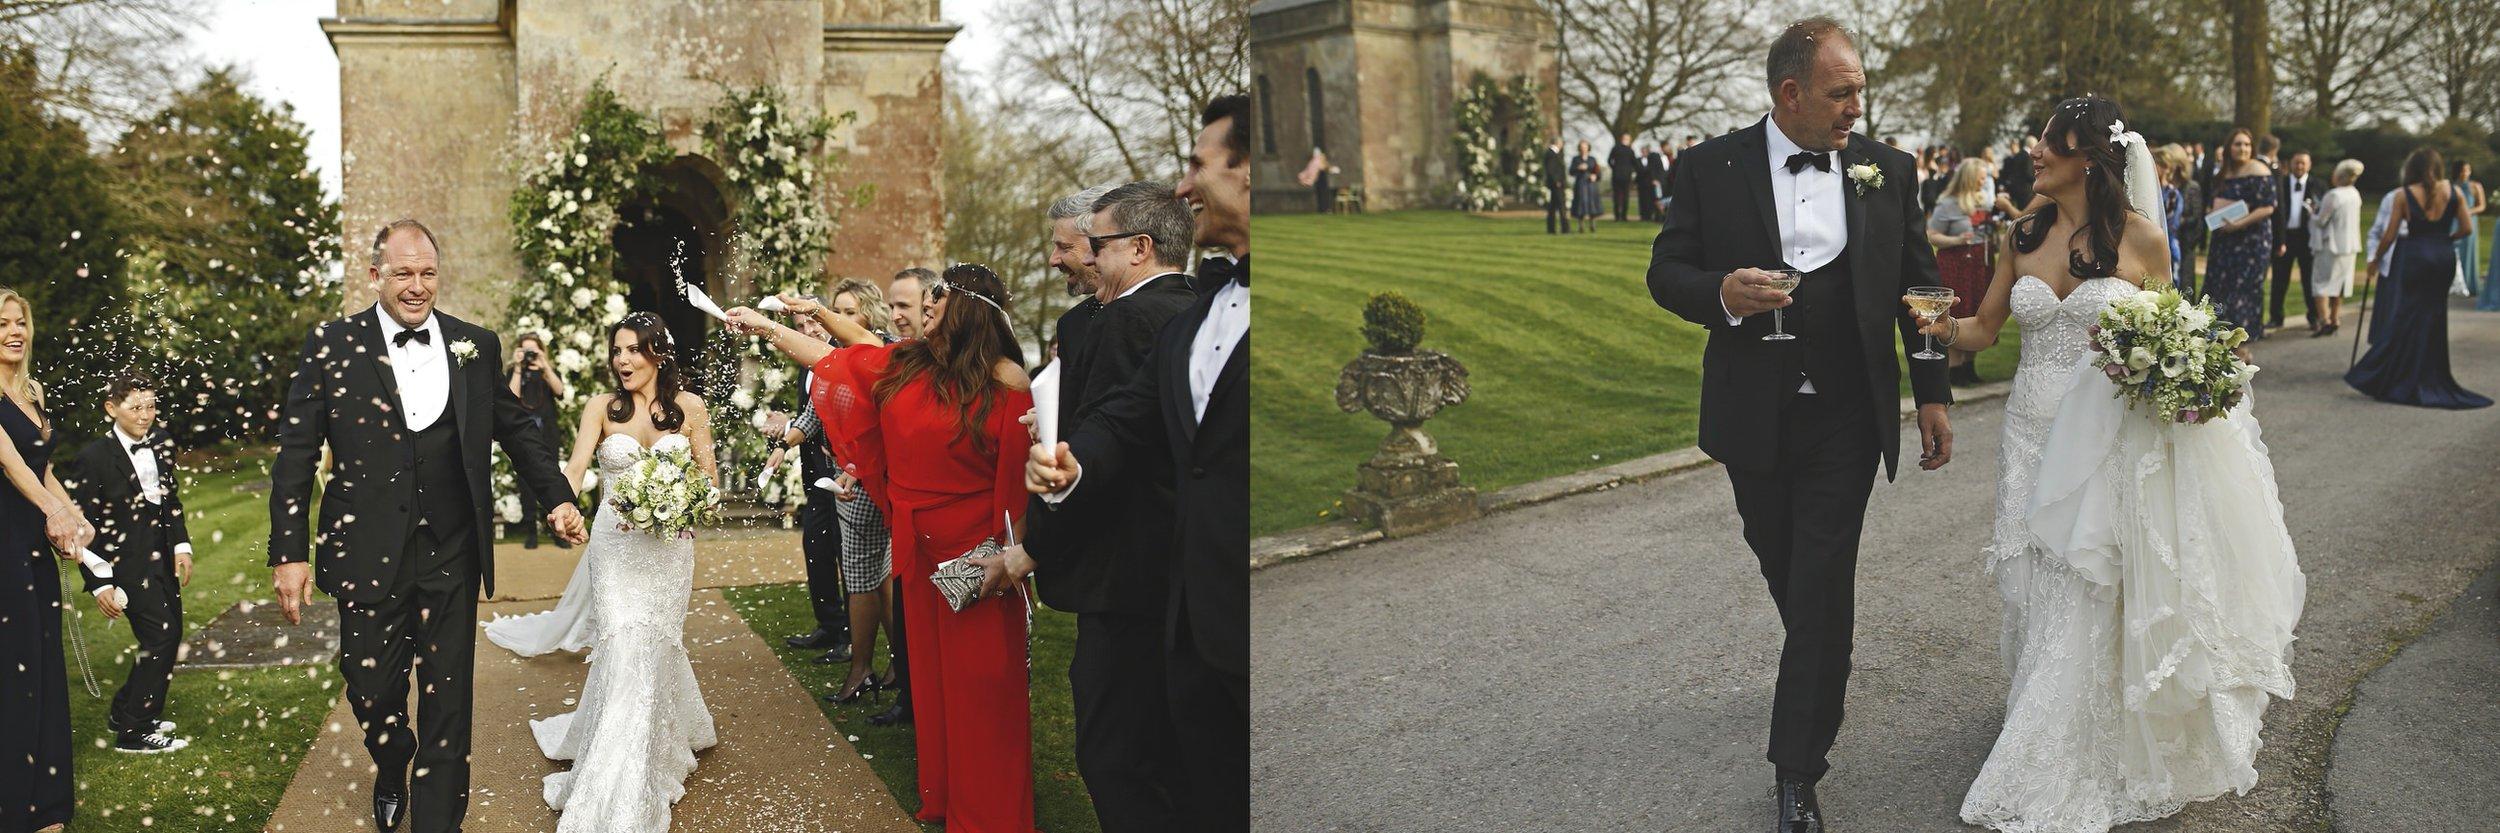 brettharkness-luxury-wedding-photographer-uk_0034.jpg